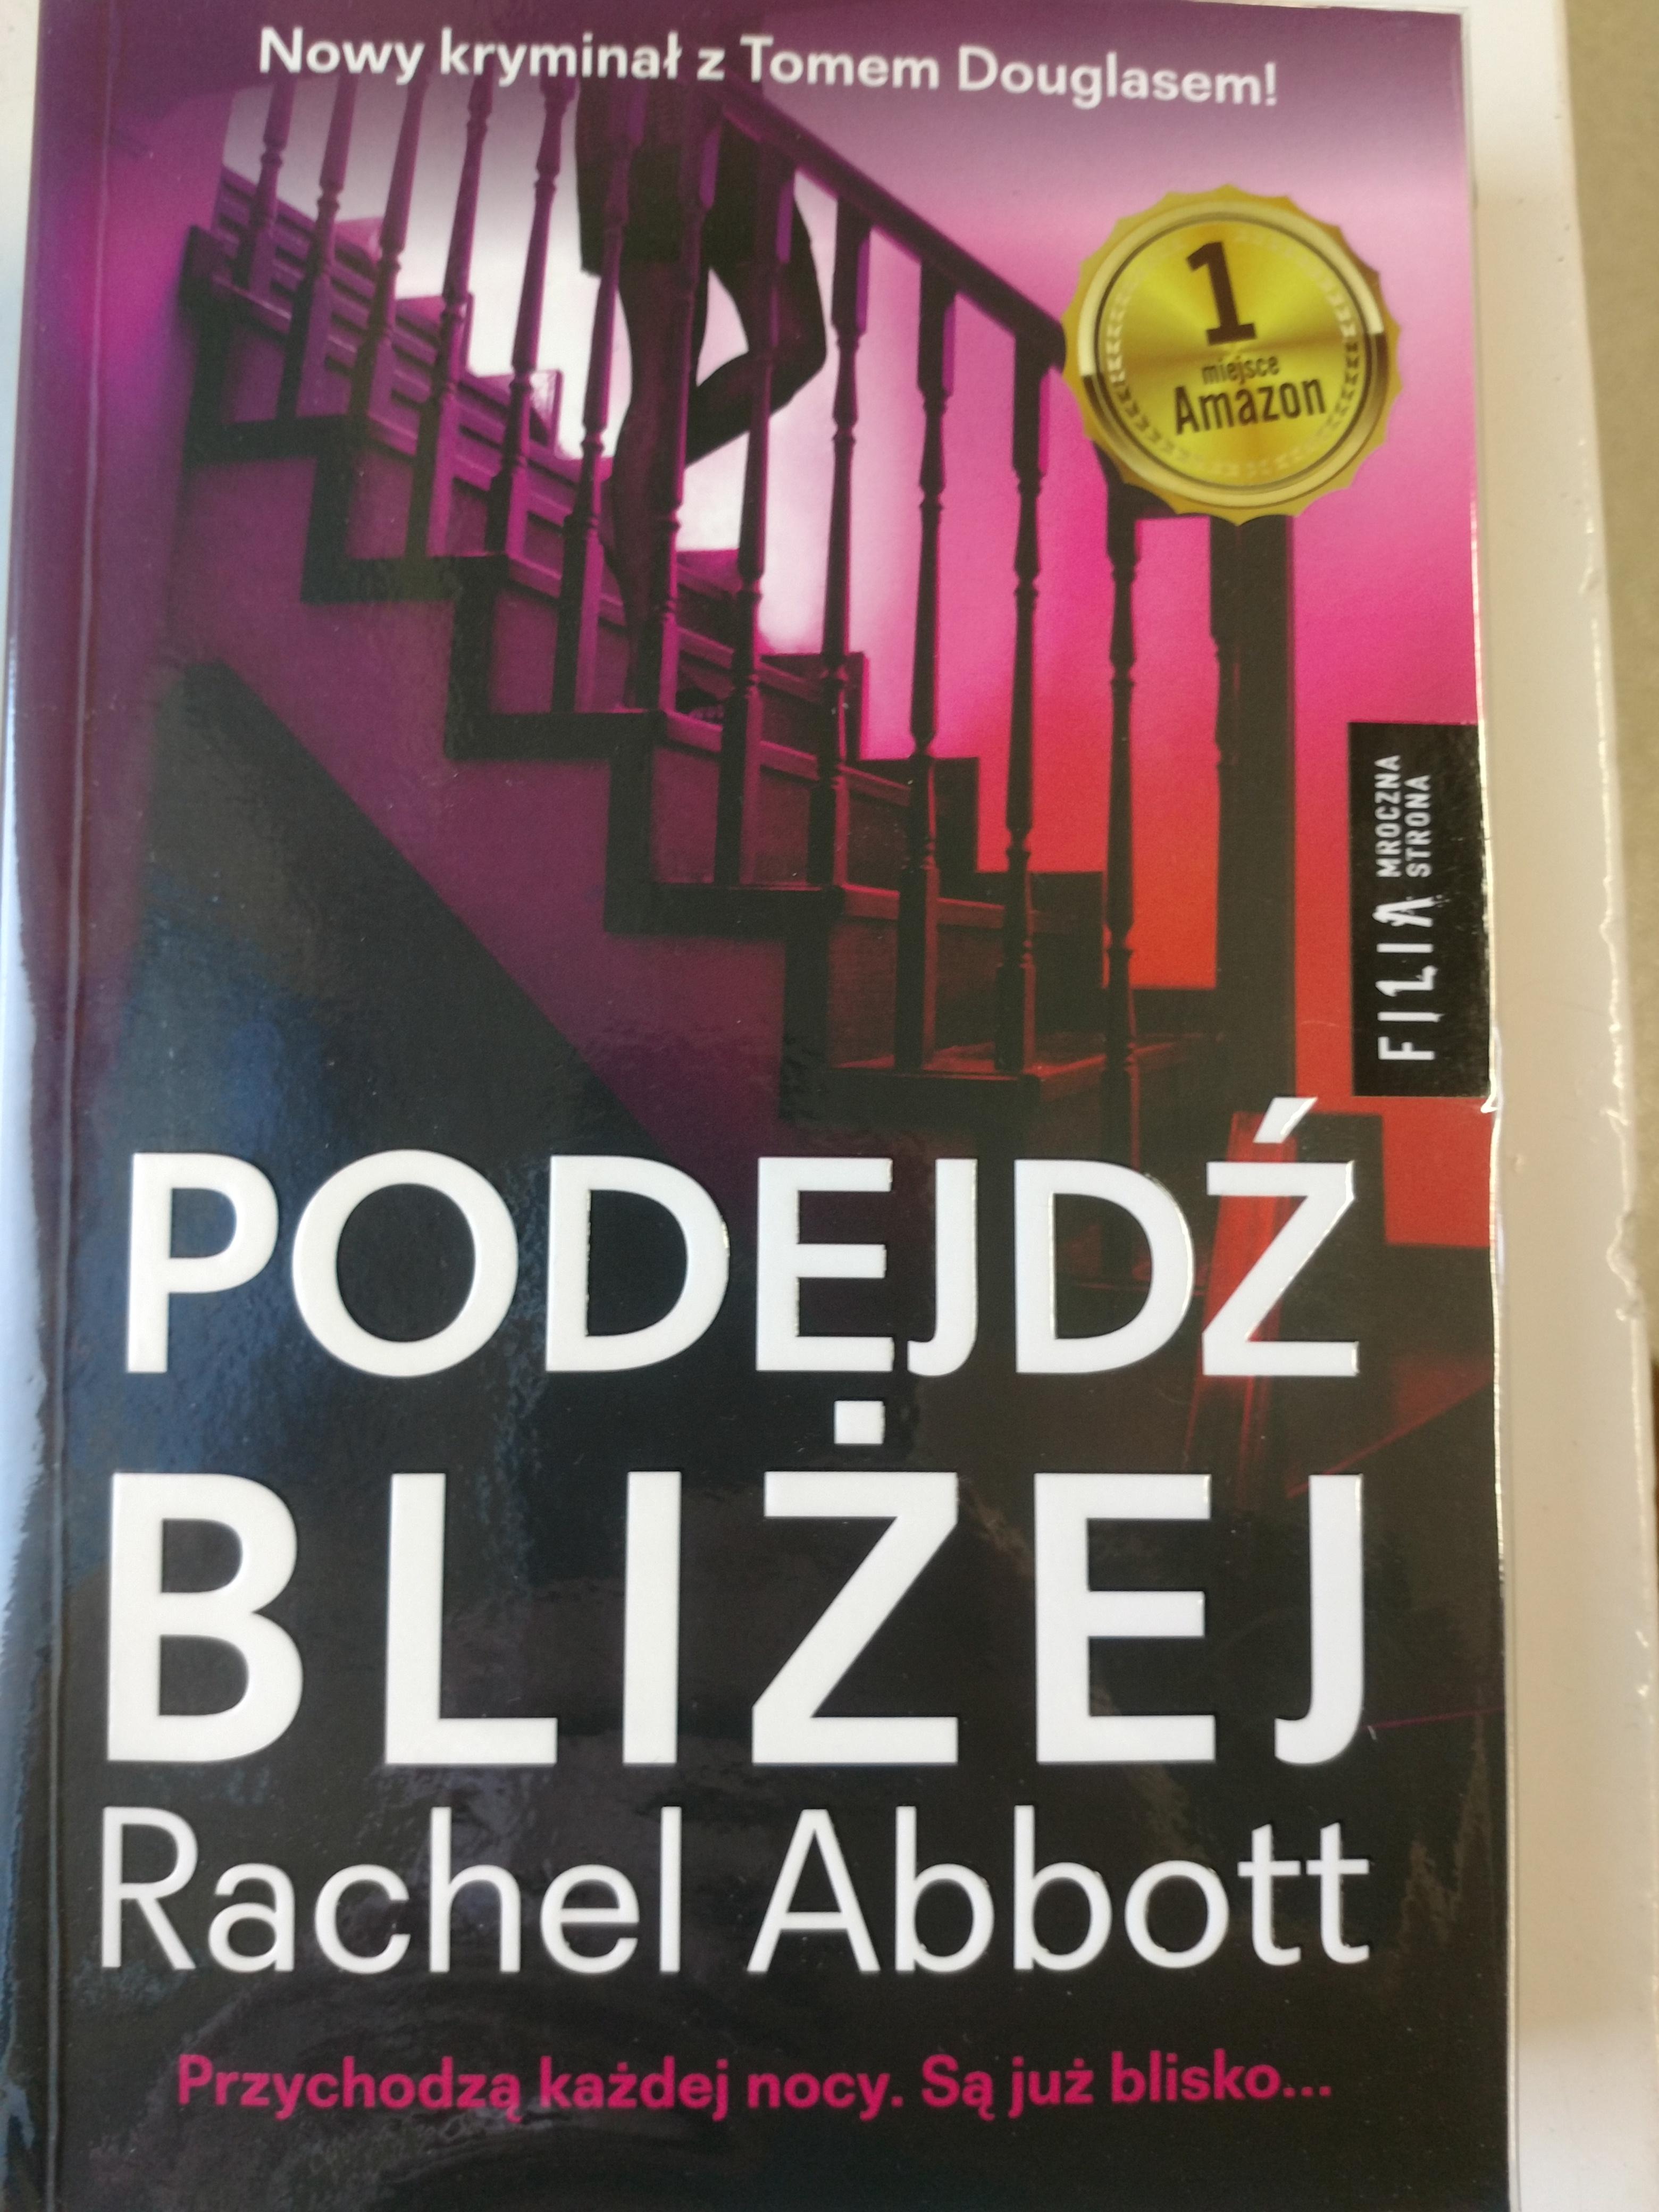 Podejdz blizej - Rachel Abbott